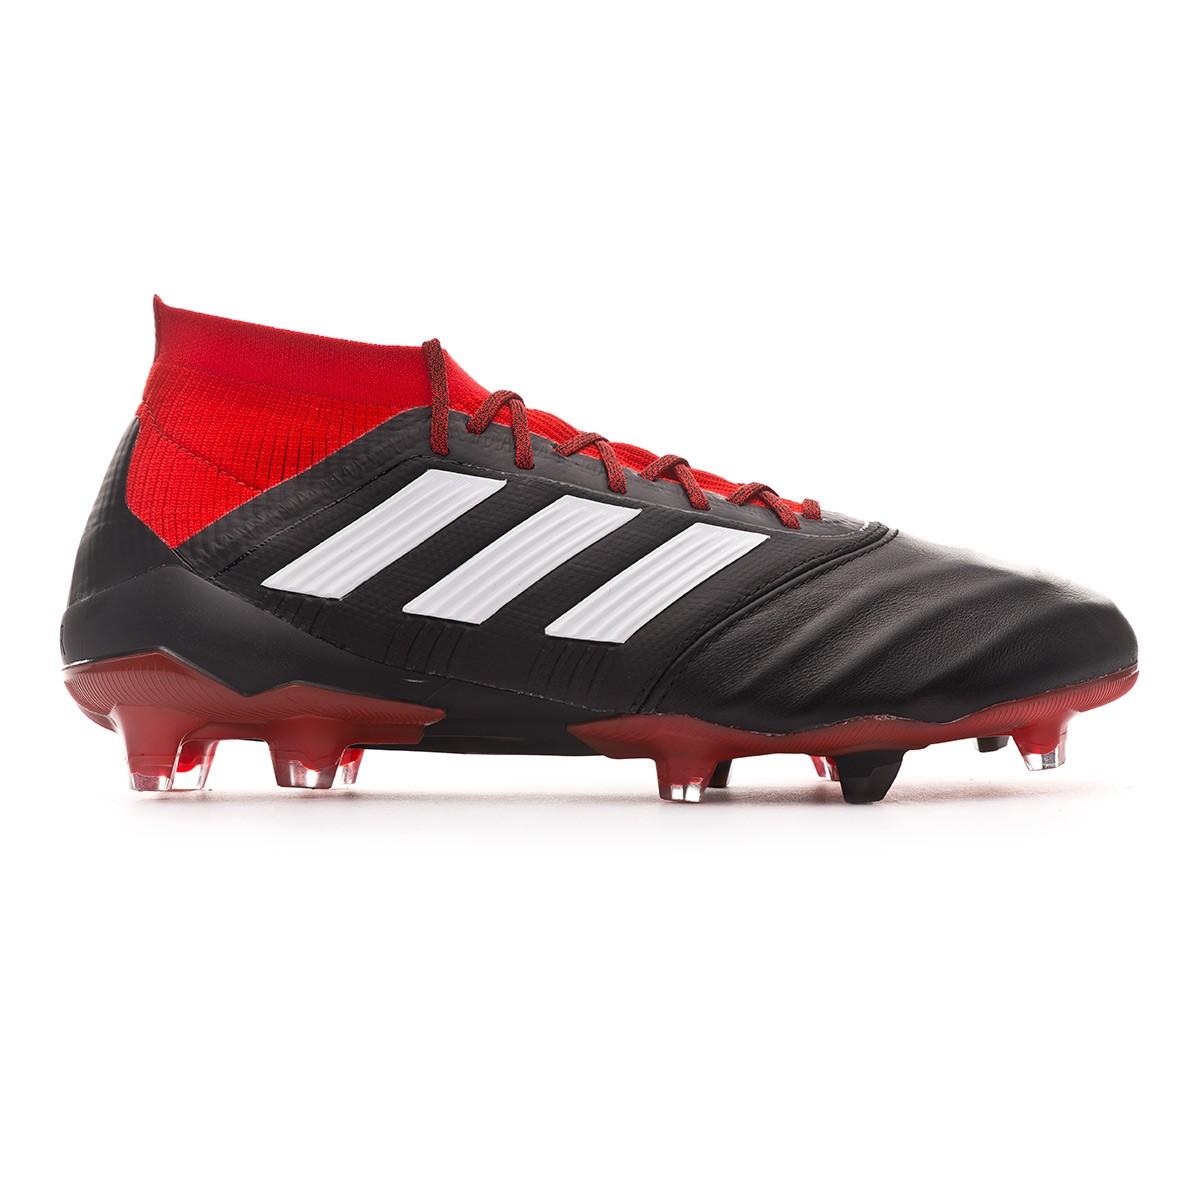 cf933aa9359 Football Boots adidas Predator 18.1 FG Leather Core black-White-Red -  Tienda de fútbol Fútbol Emotion